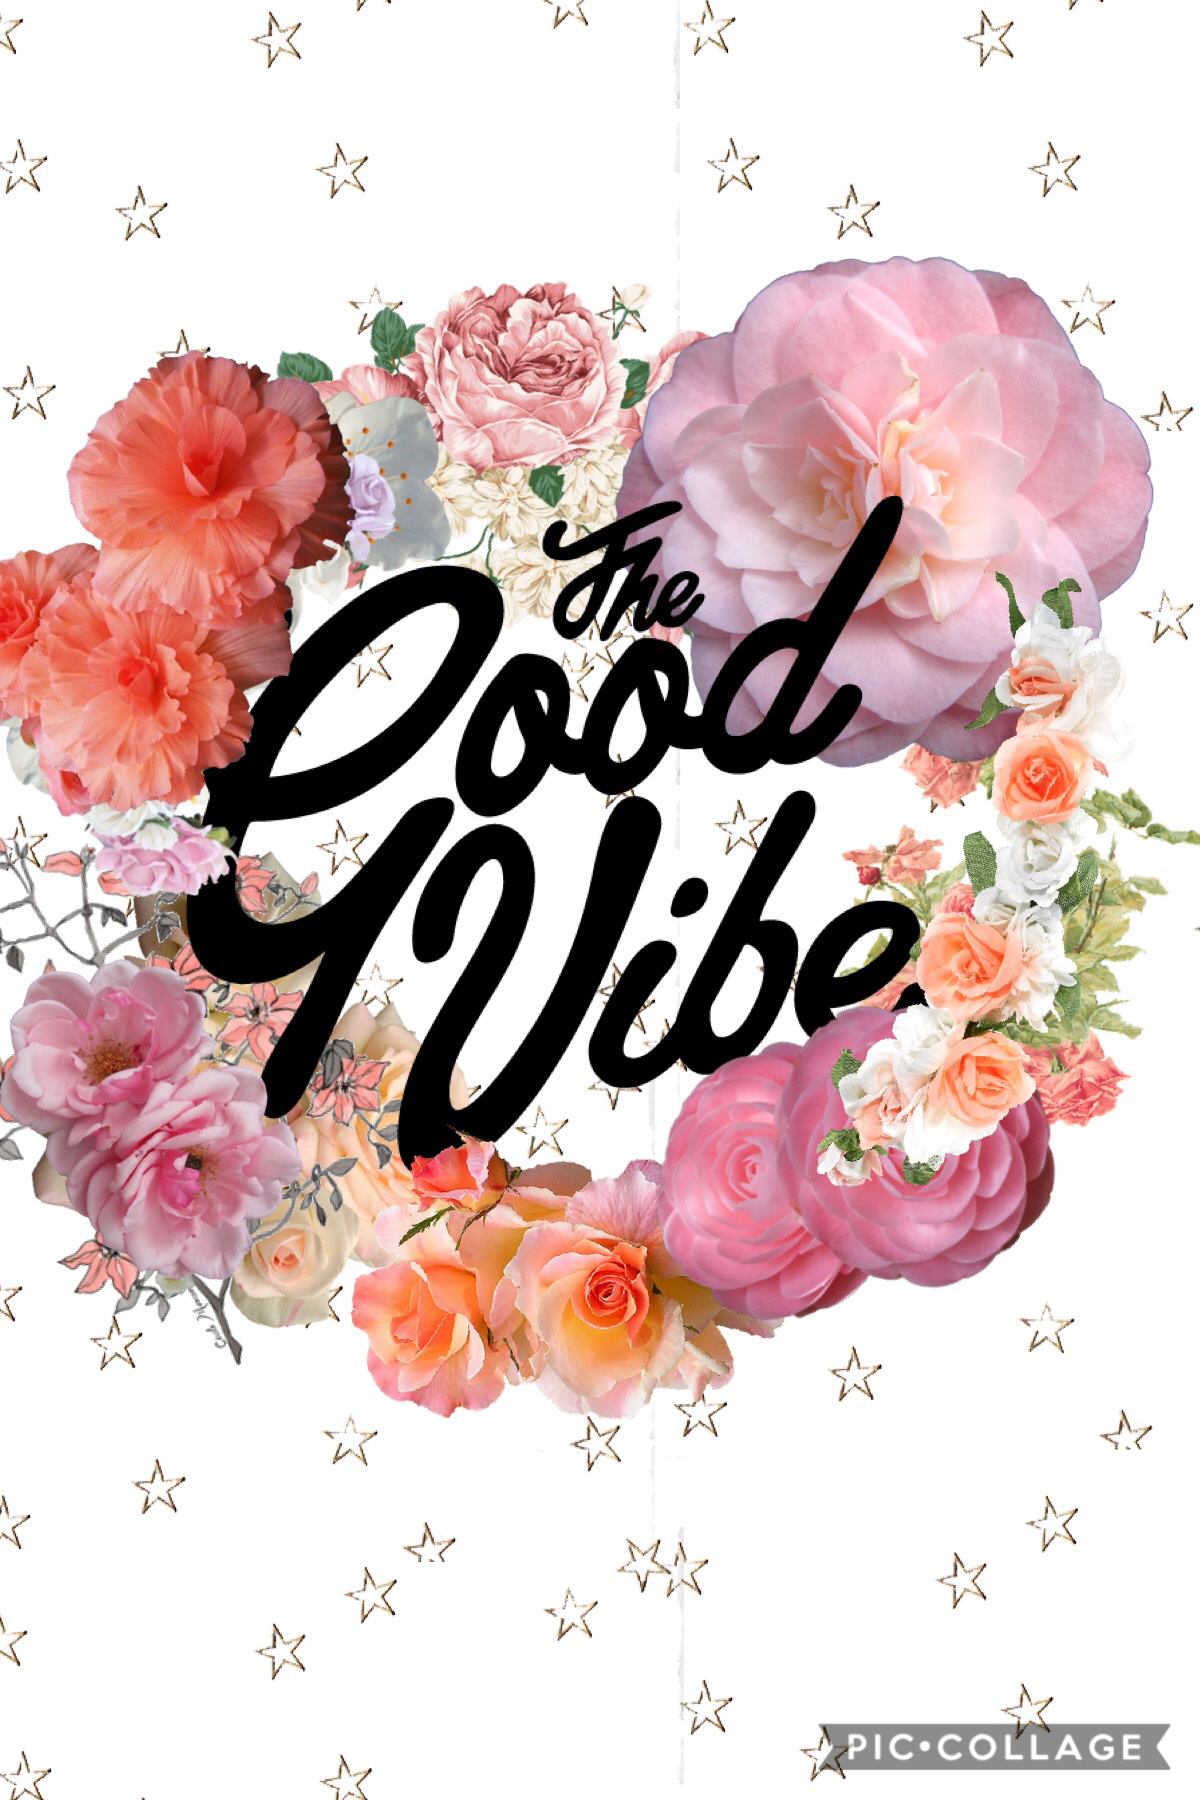 #good #vibes